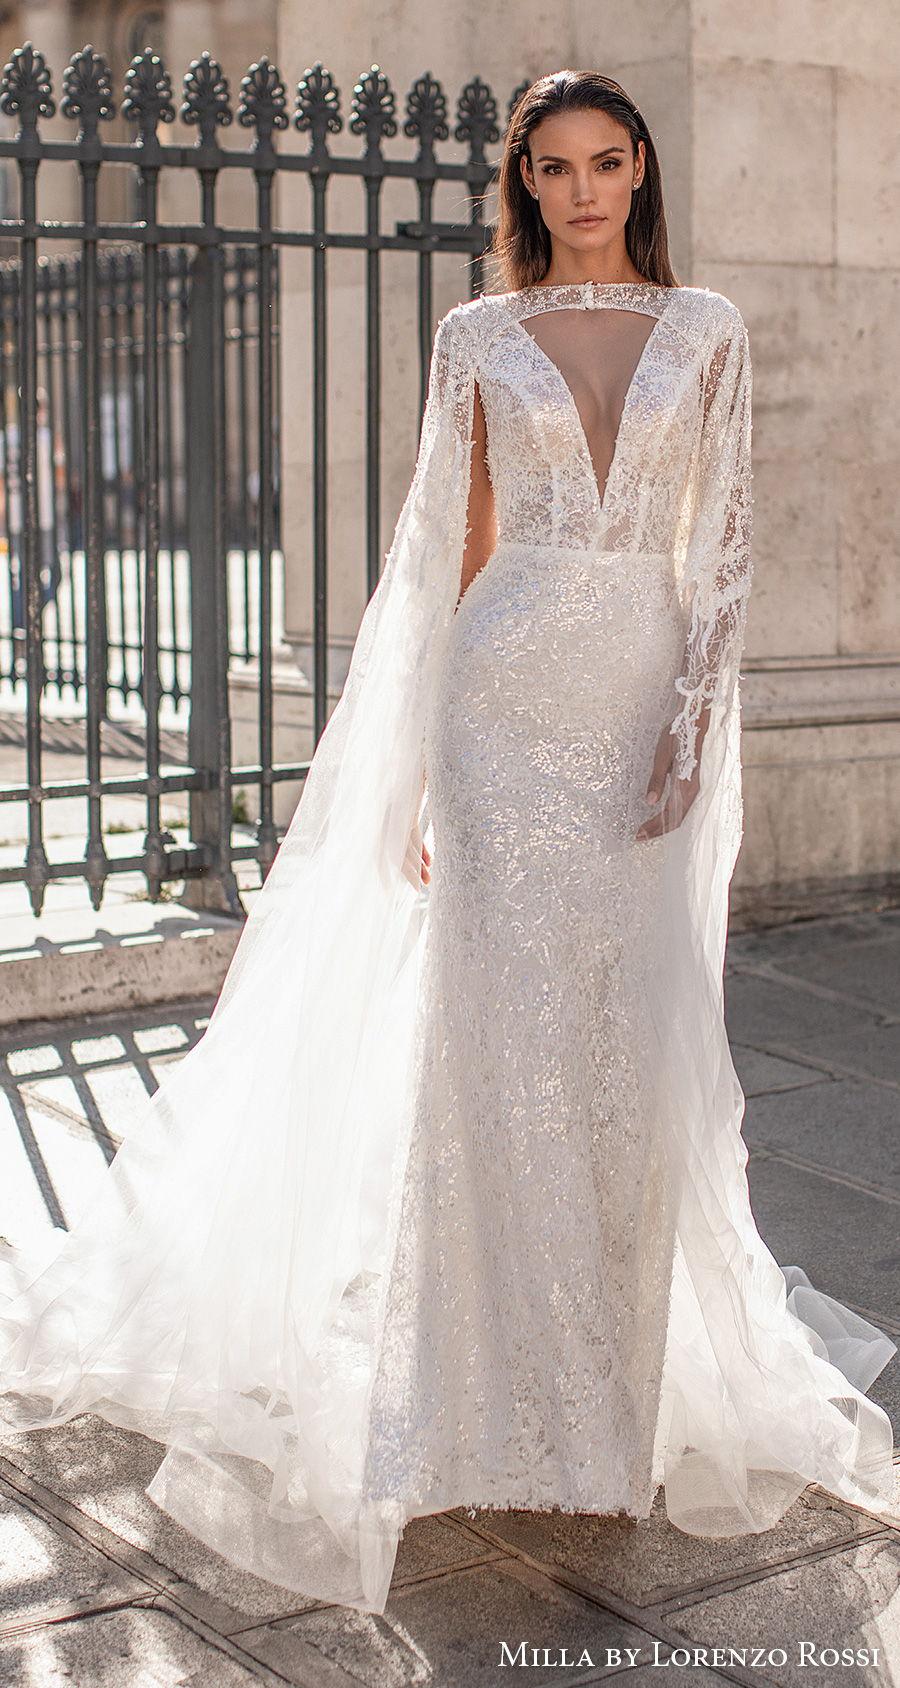 milla lorenzo rossi 2021 bridal cap sleeves deep v neck full embellishment elegant glamorous sheath wedding dress cape v back chapel train (brie) mv